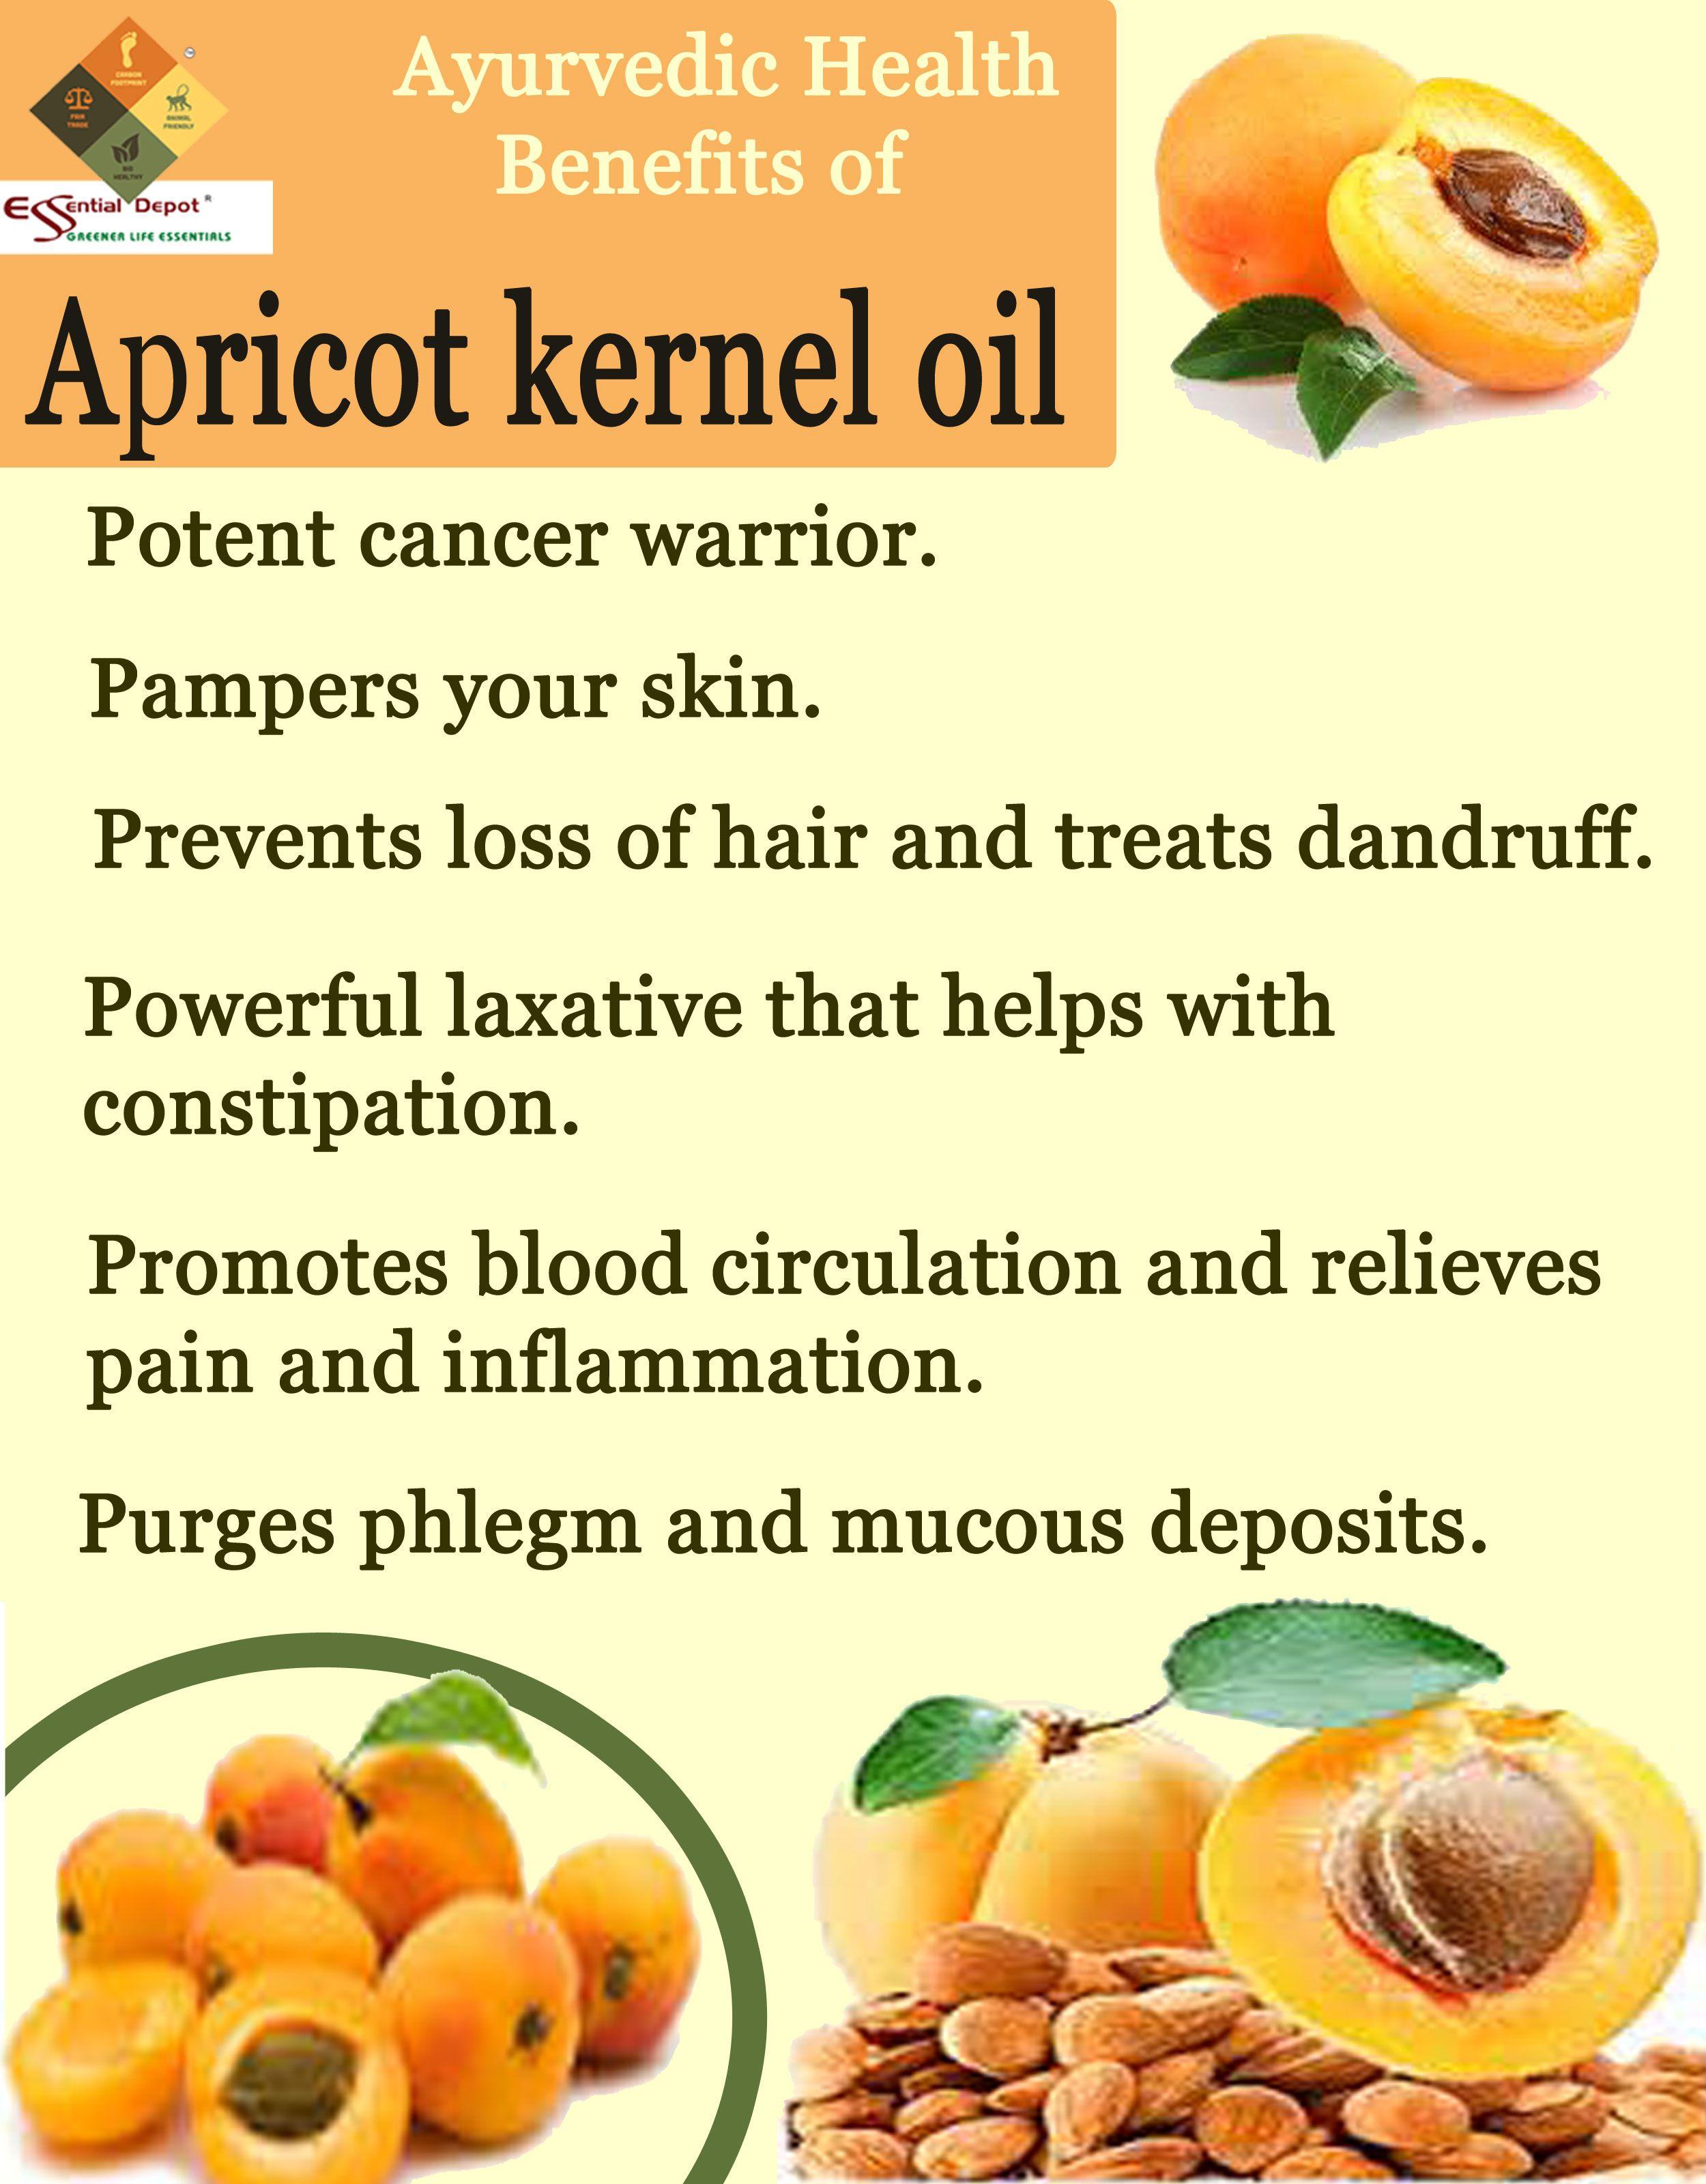 Ayurvedic health benefits of Apricot kernel oil | Ayurvedic Oils